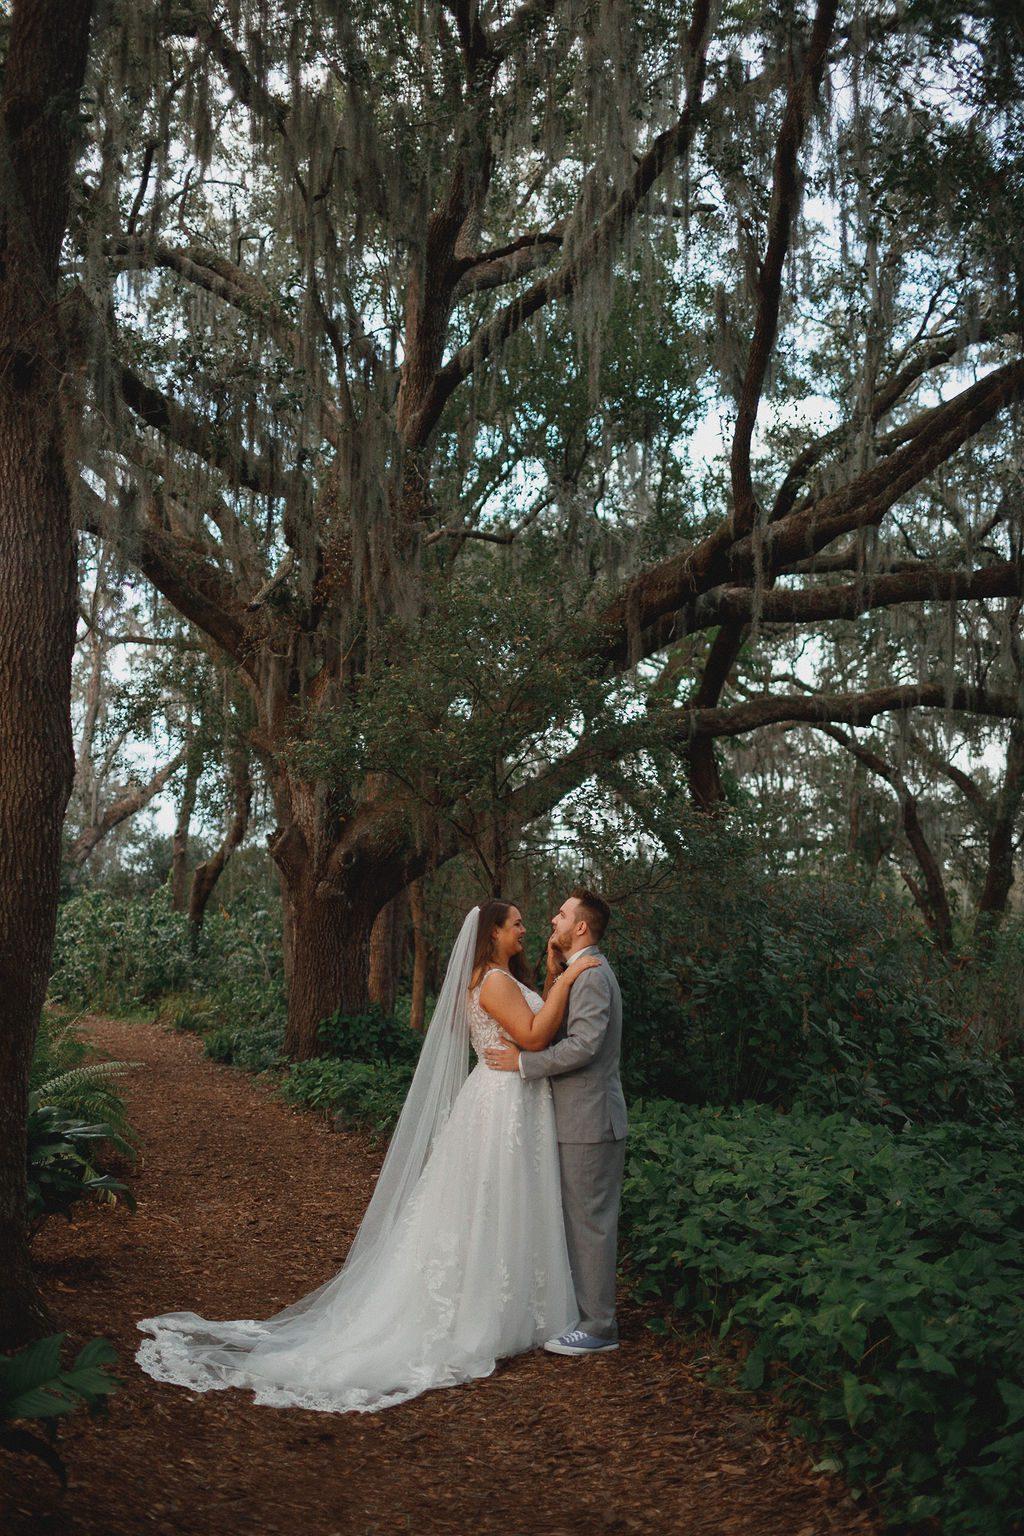 Daniela + Thomas's Rustic Ranch Wedding